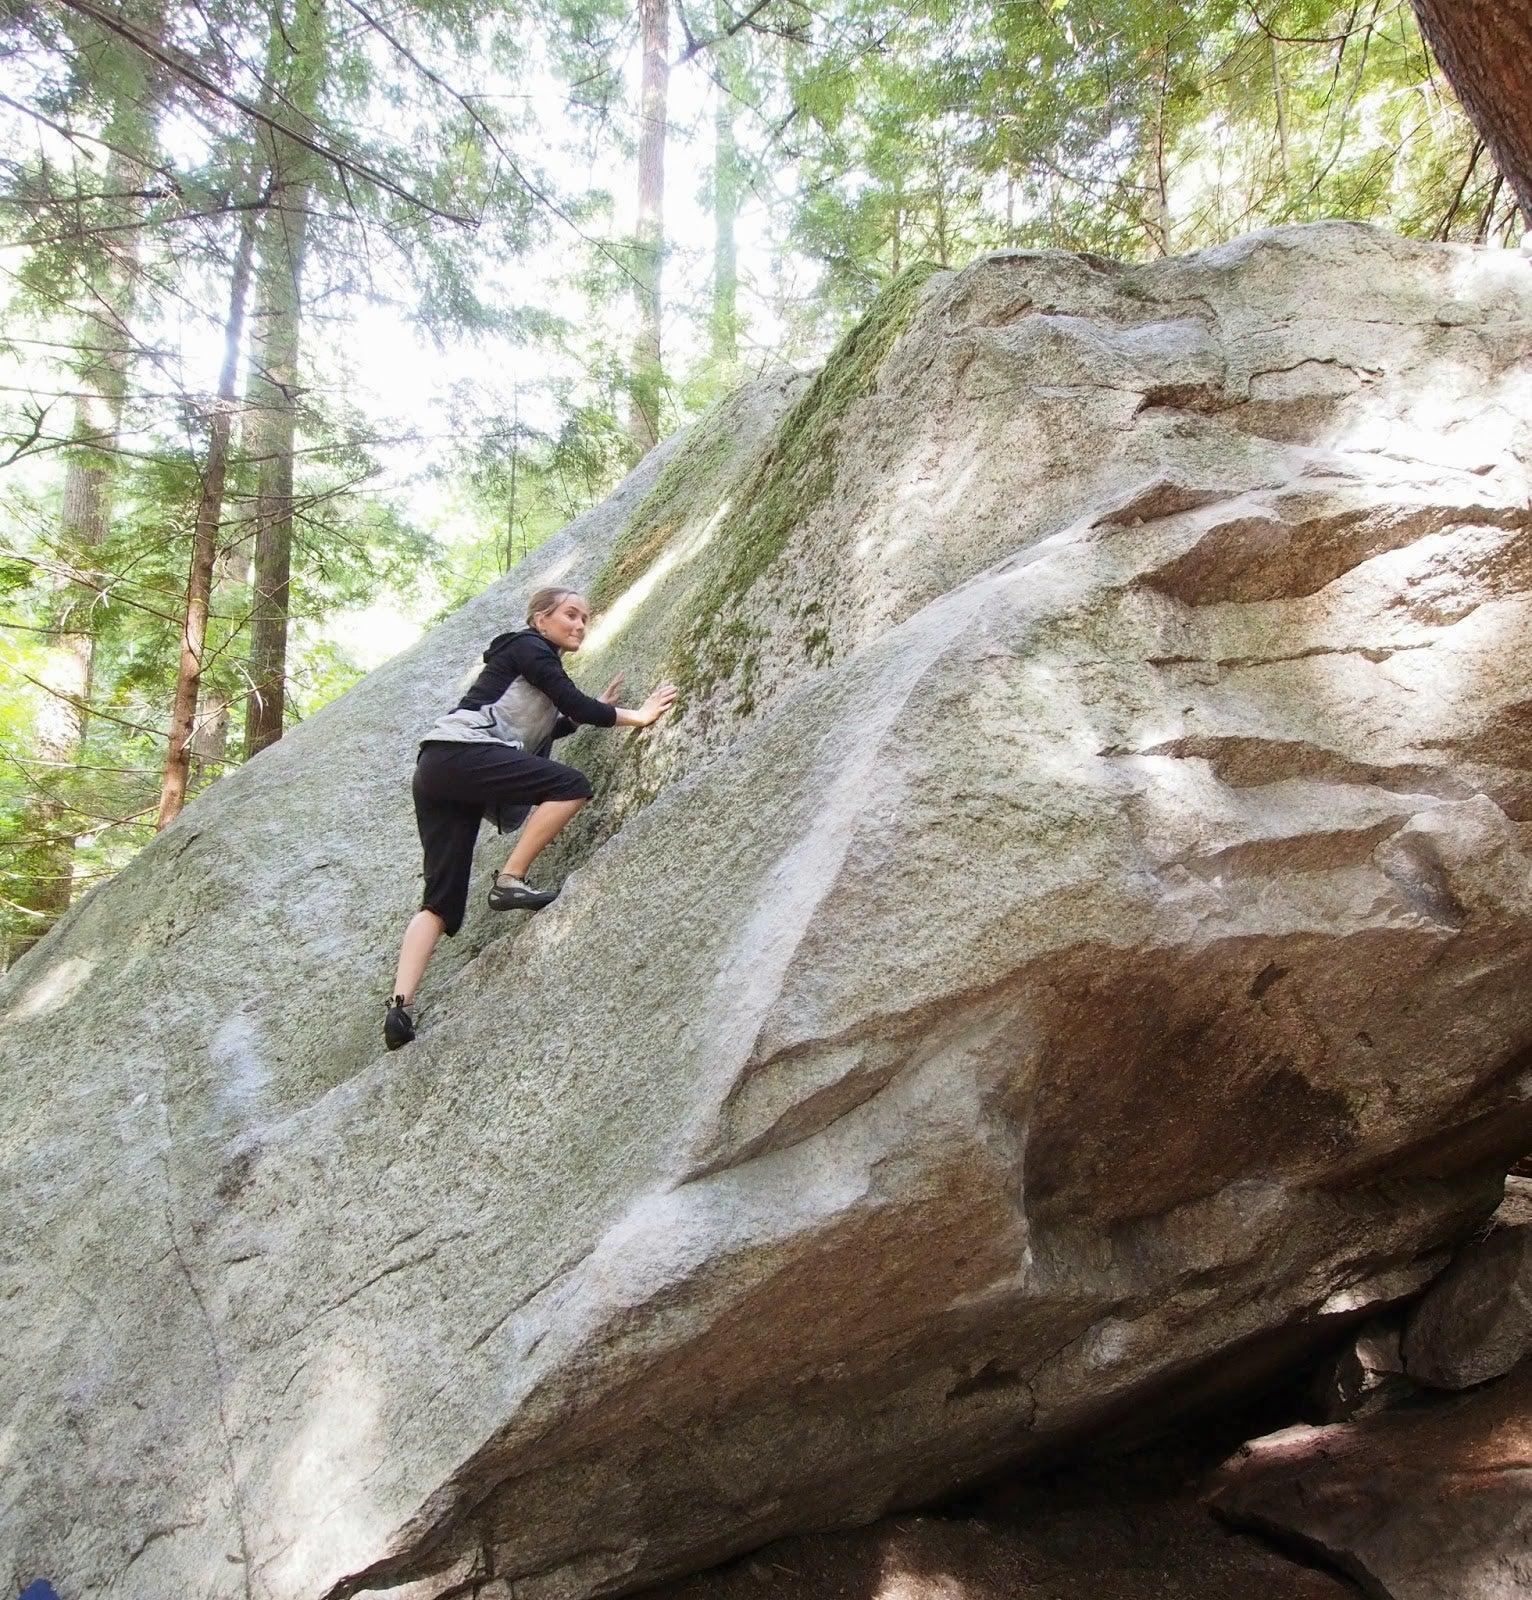 Beth Rodden's Return To Climbing